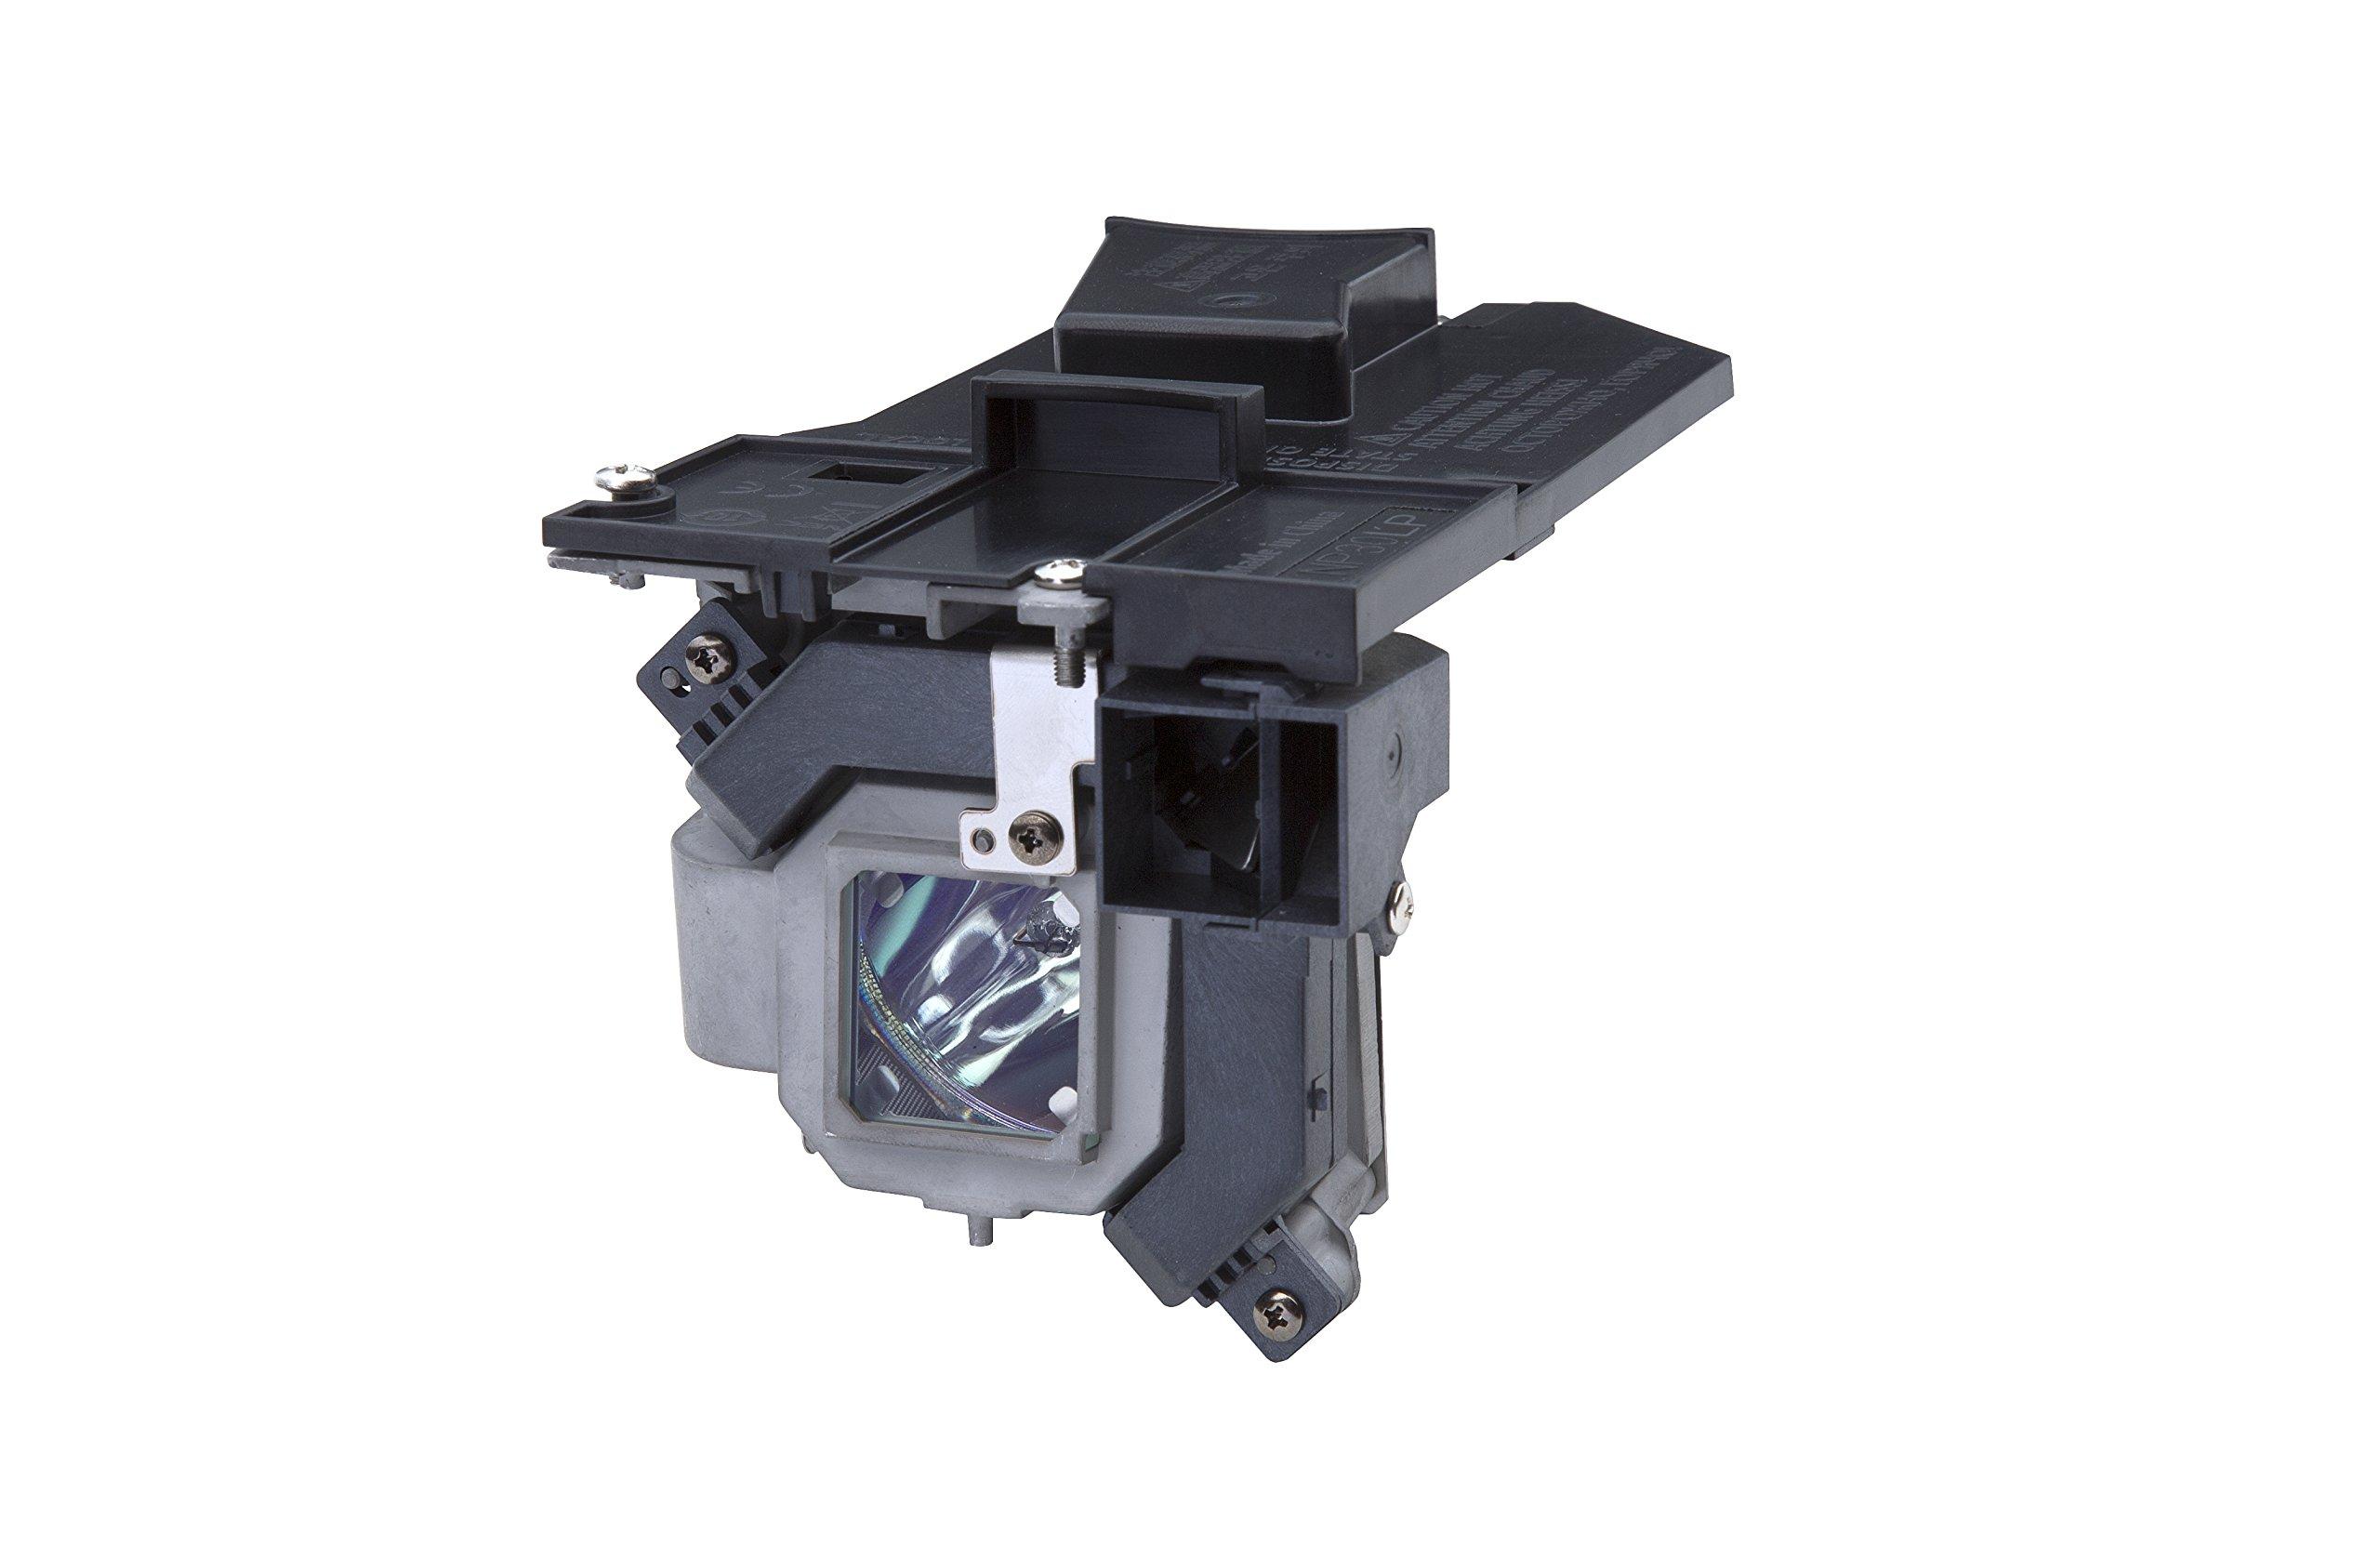 NEC Projector Lamp for NP-M322X and NP-M322W NP28LP